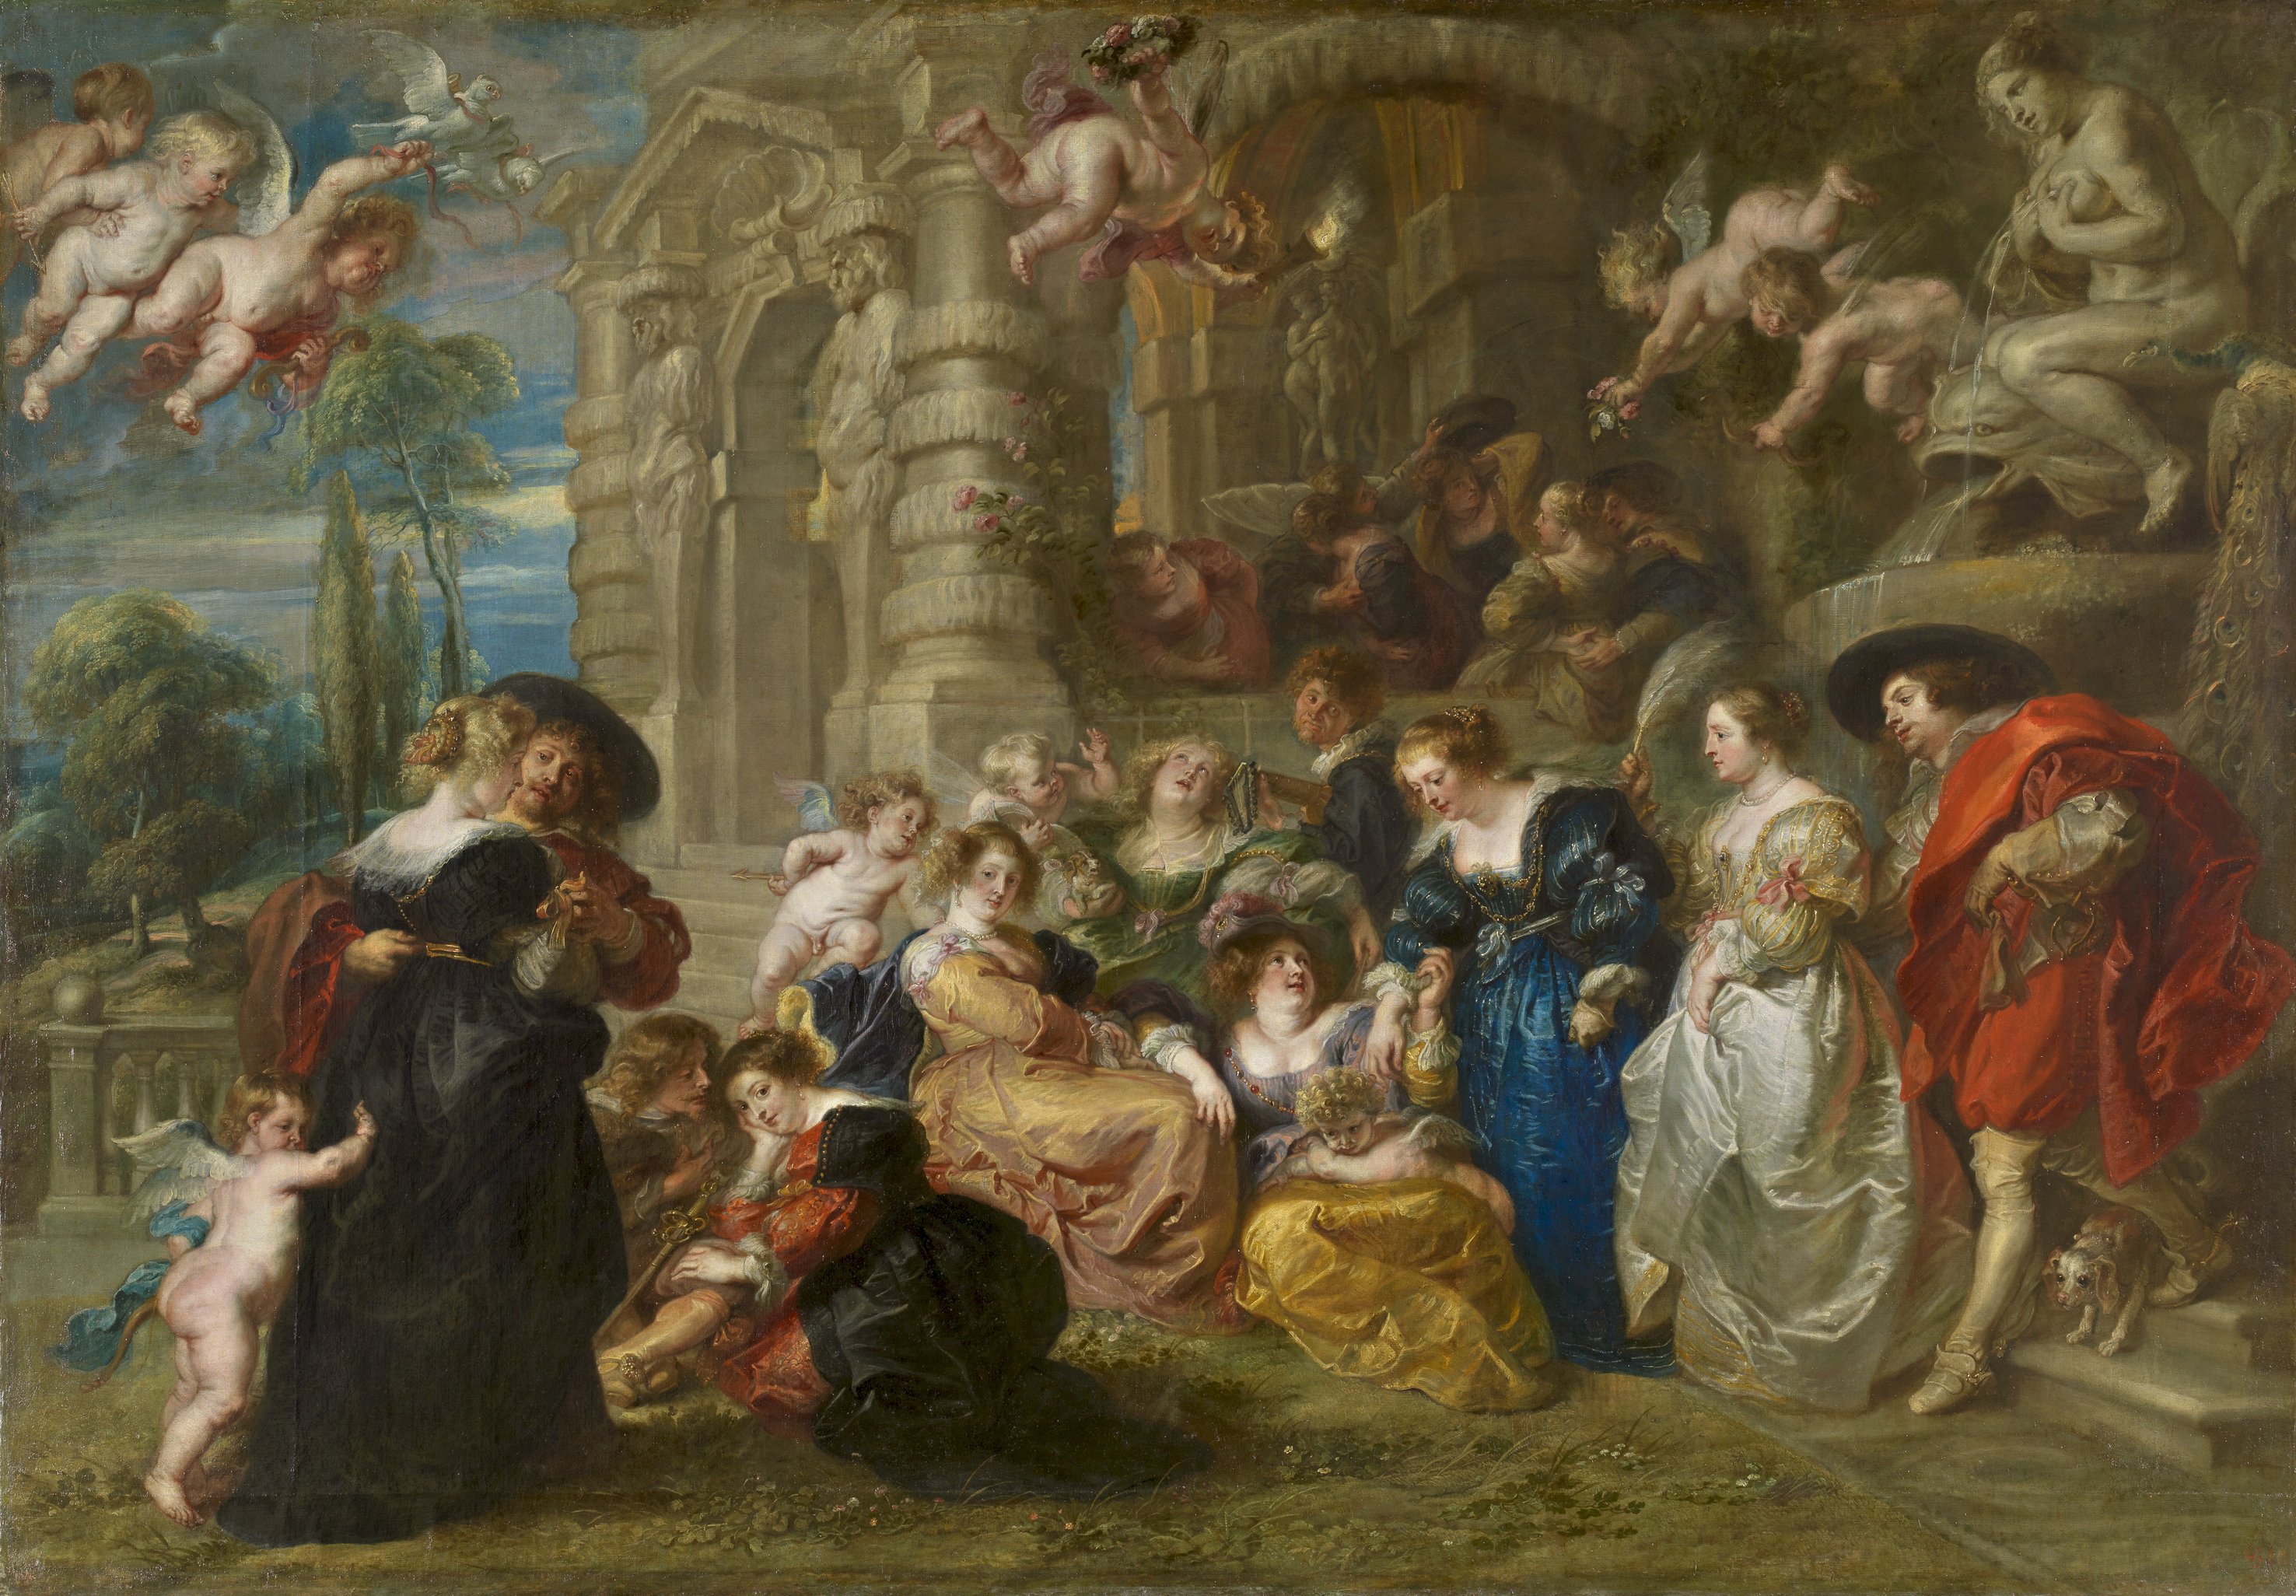 Питер Пауль Рубенс, «Сад Любви» (1630-1631). Источник: www.dailyartmagazine.com